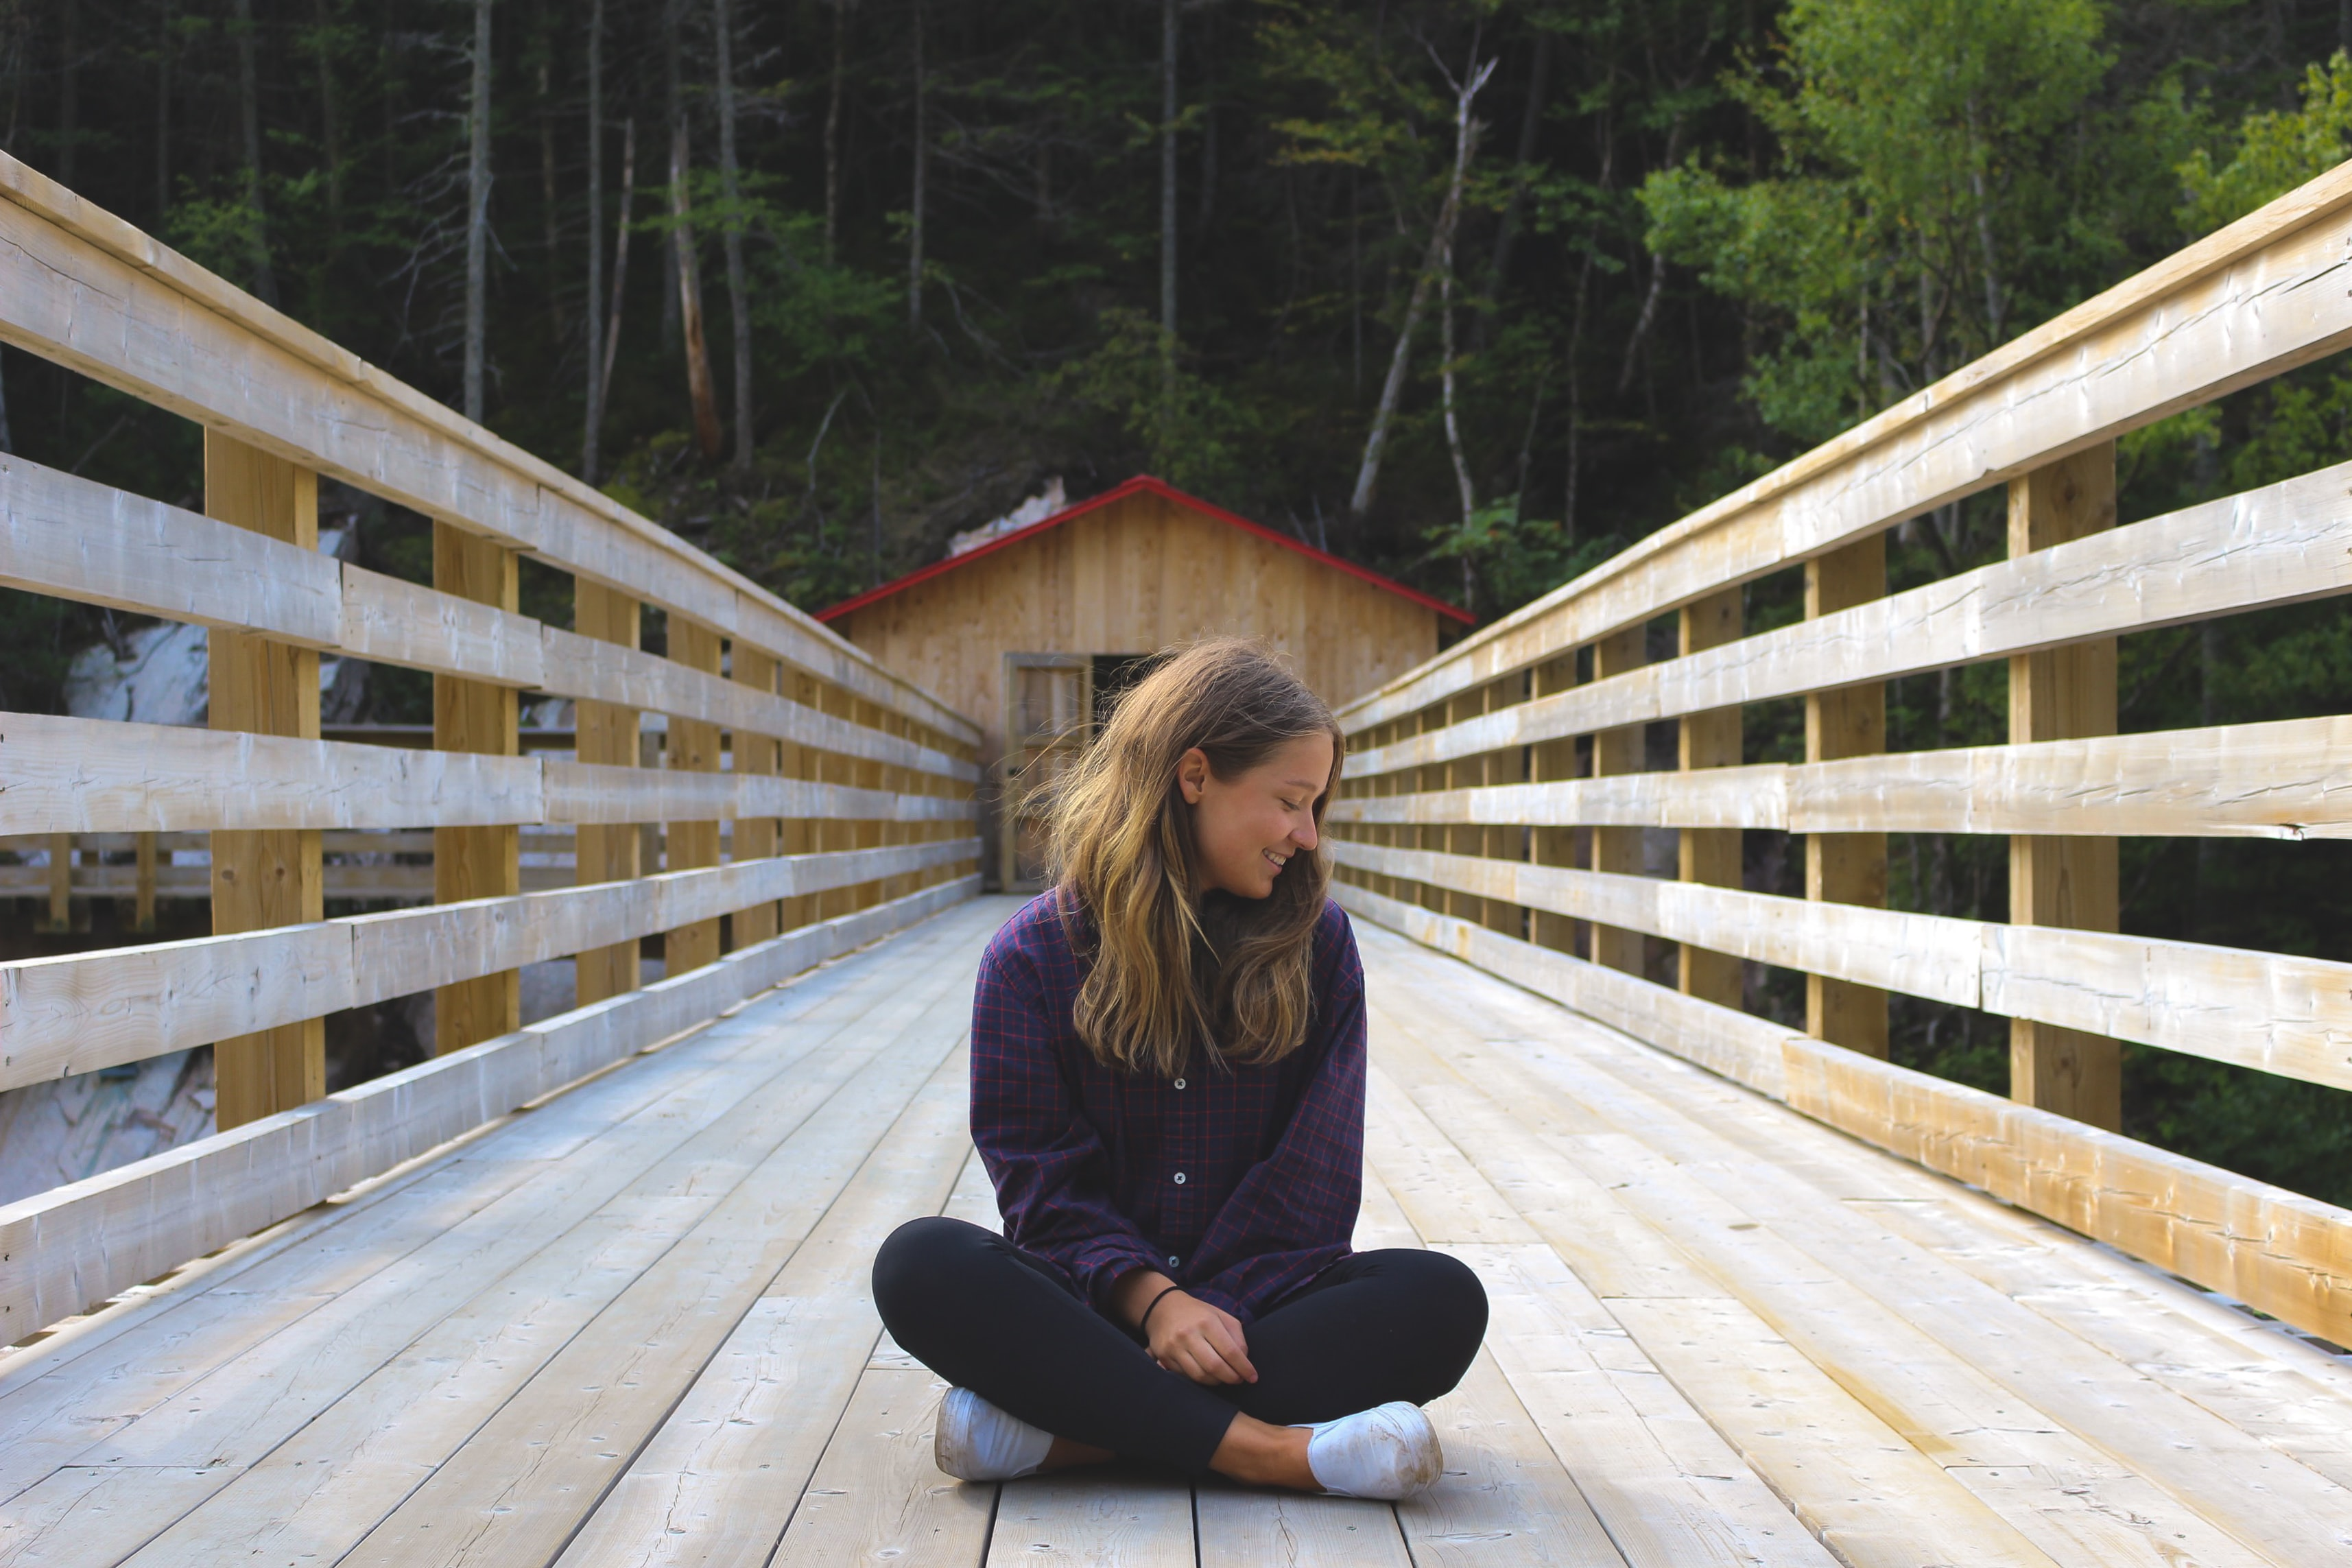 woman sitting on wooden bridge near forest